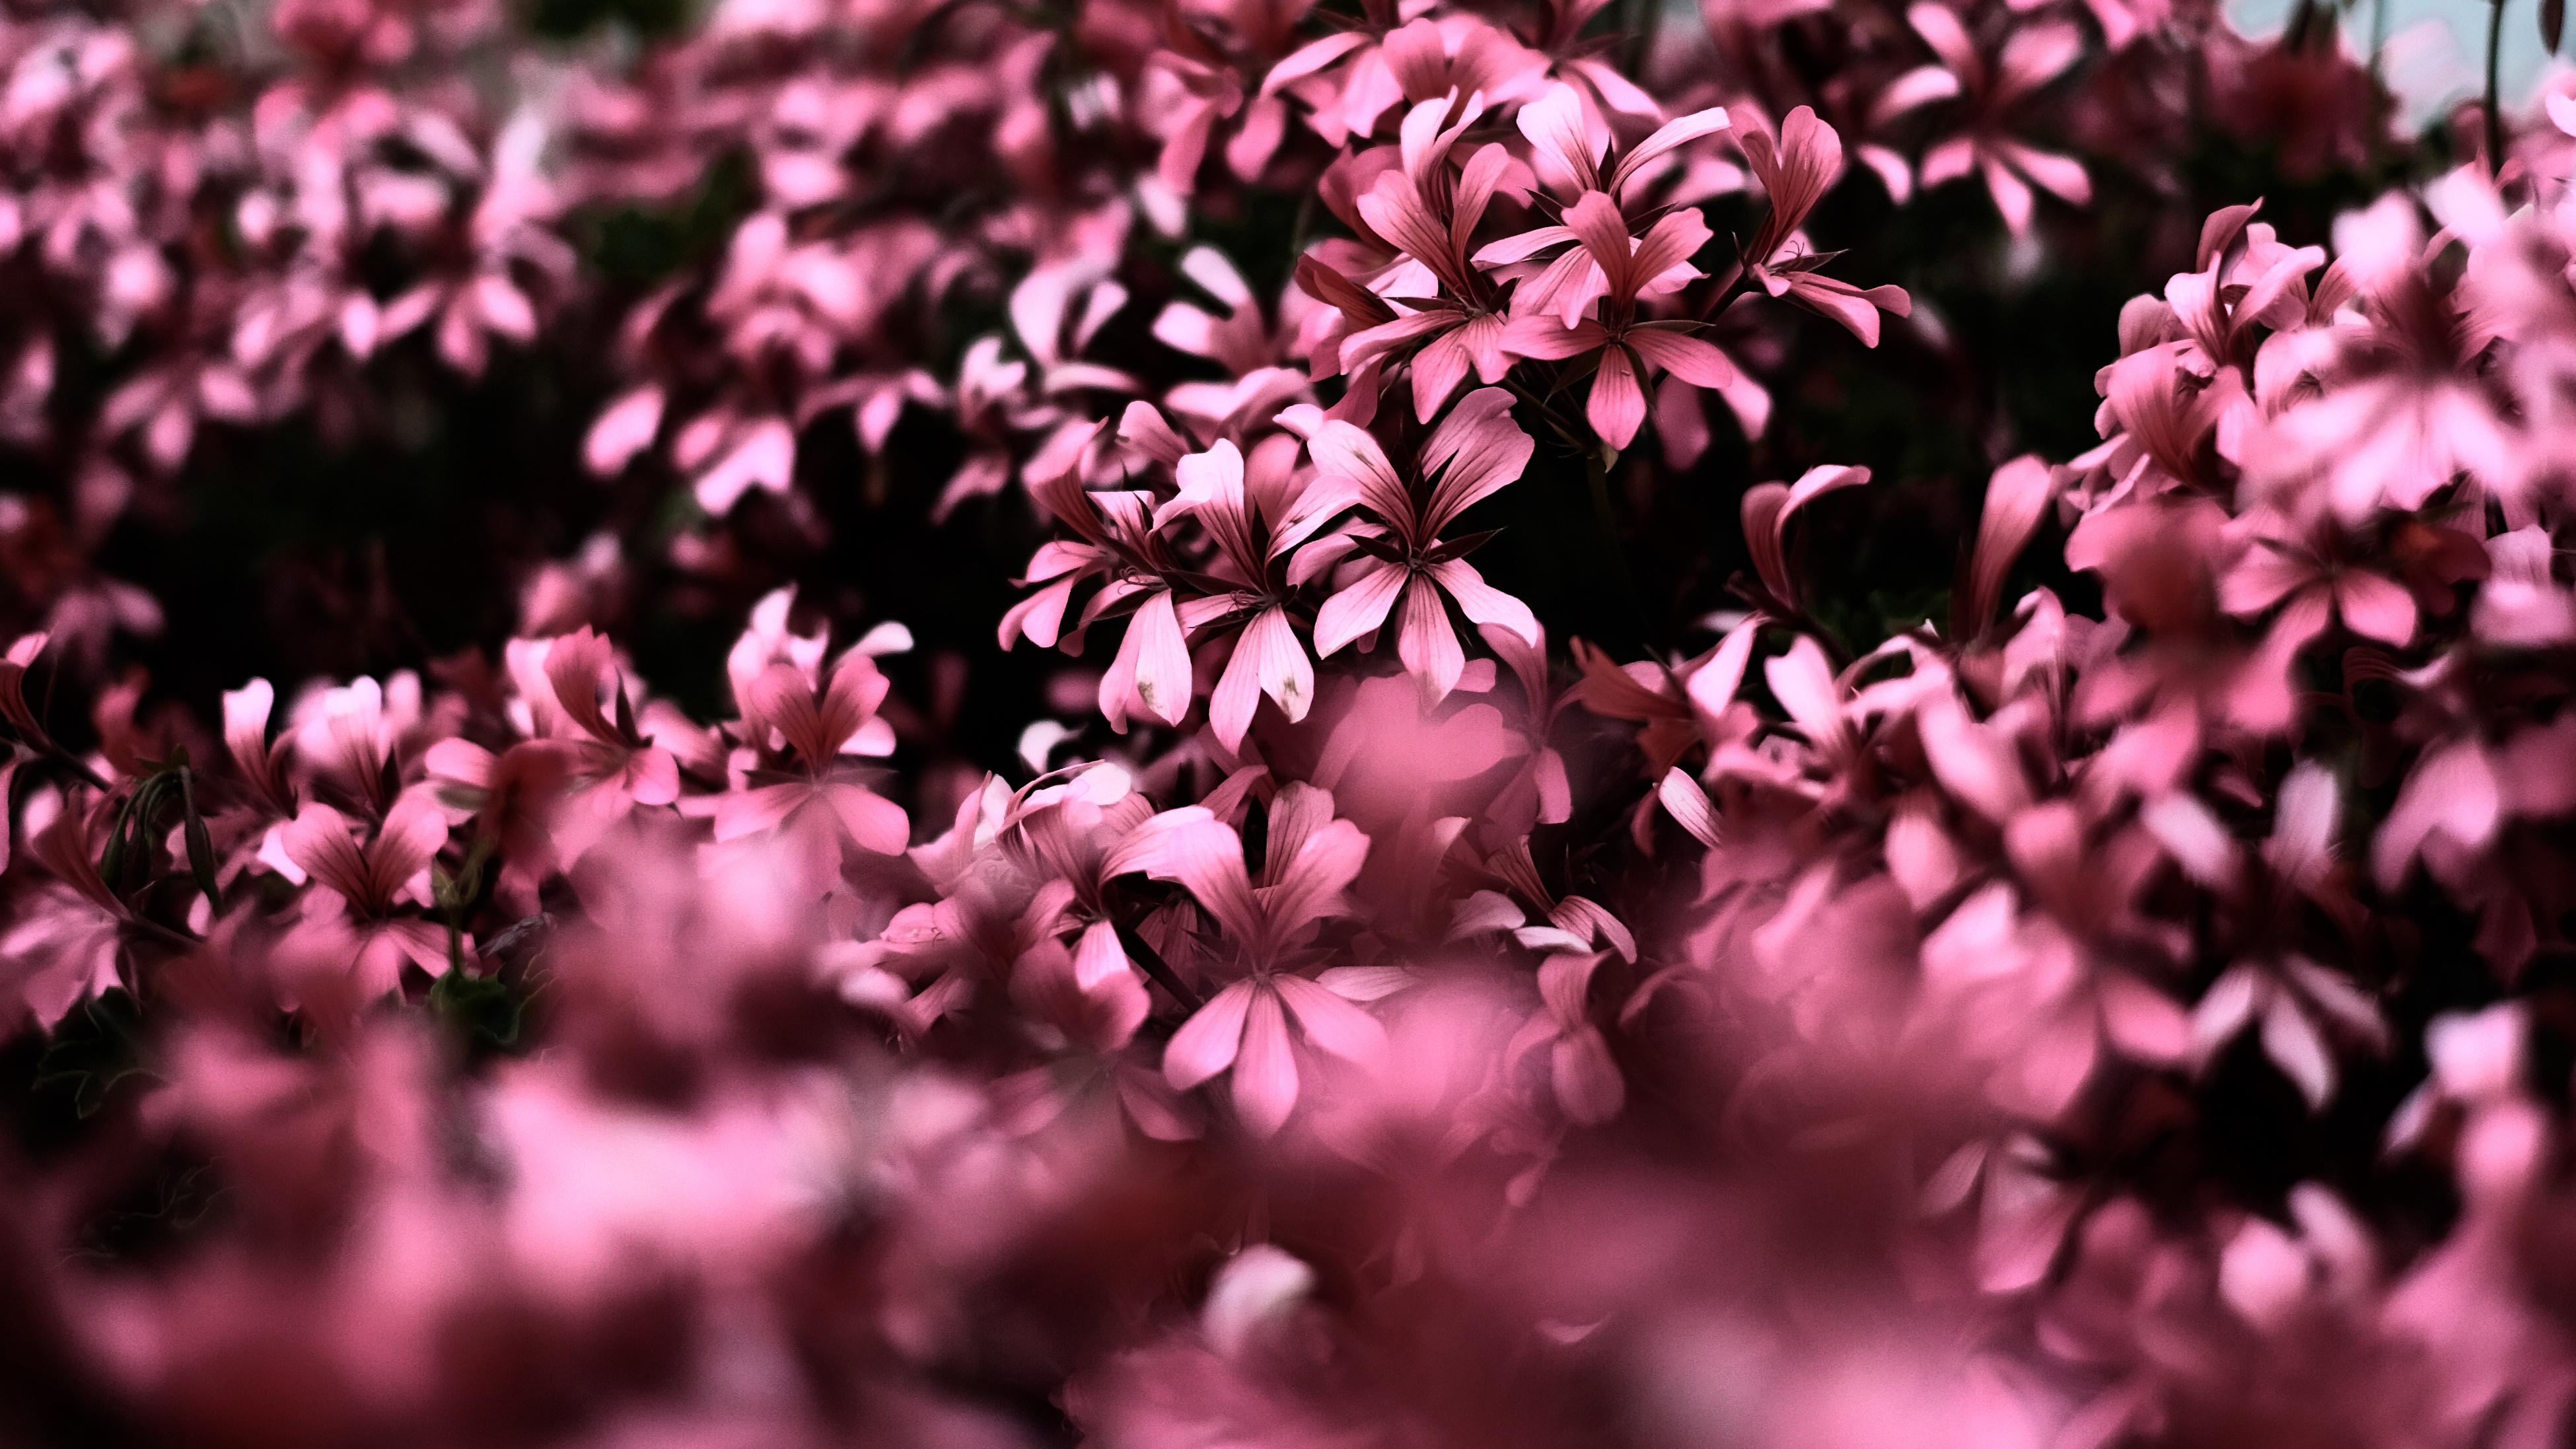 Pink Flowers Ultra Hd Blur 4k Hd Flowers 4k Wallpapers Images